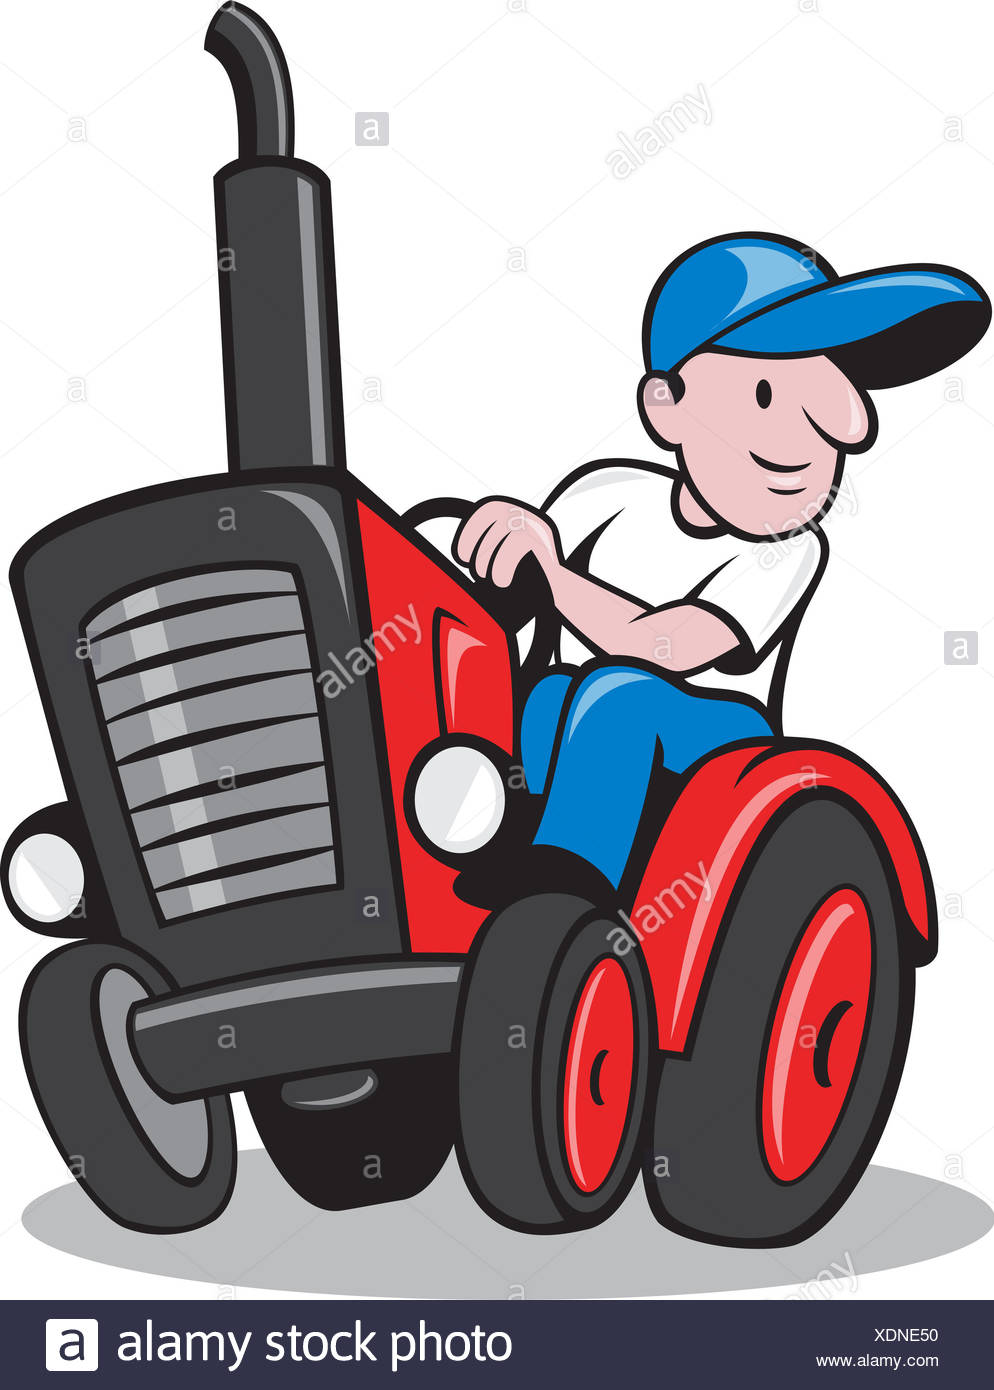 Cartoon Farmer Tractor Stock Photos Cartoon Farmer Tractor Stock